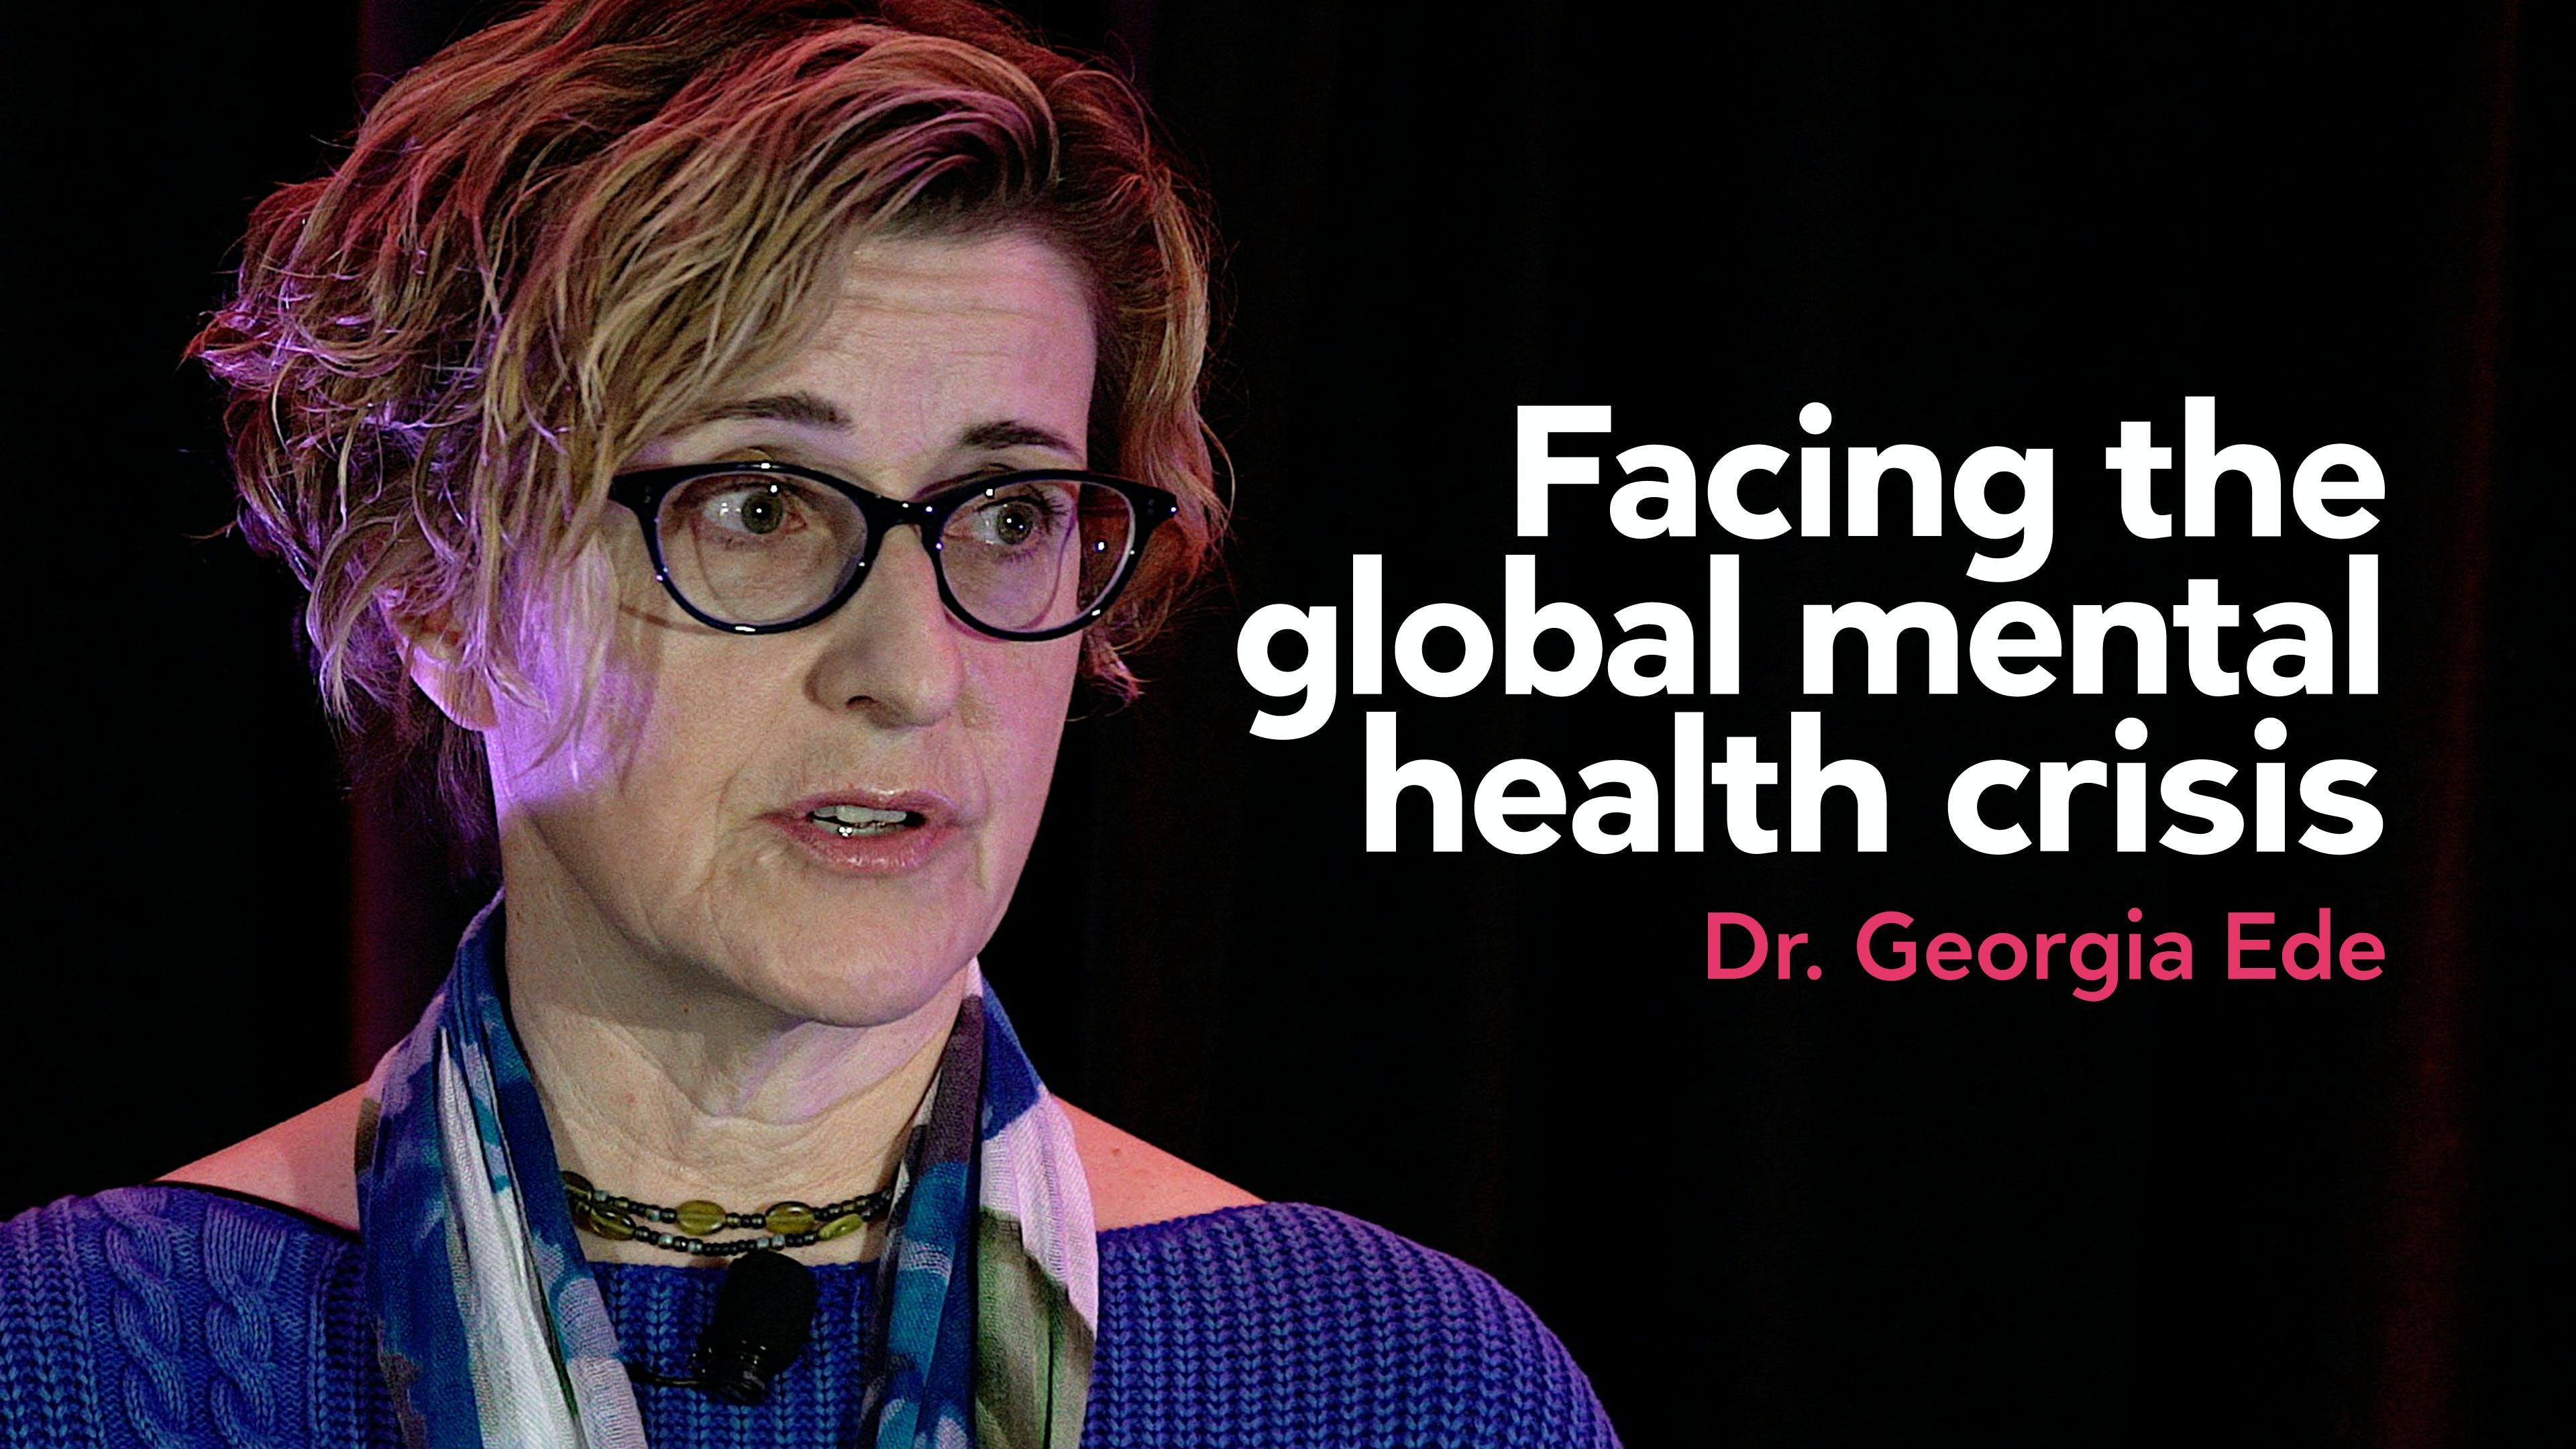 Facing the global mental health crisis